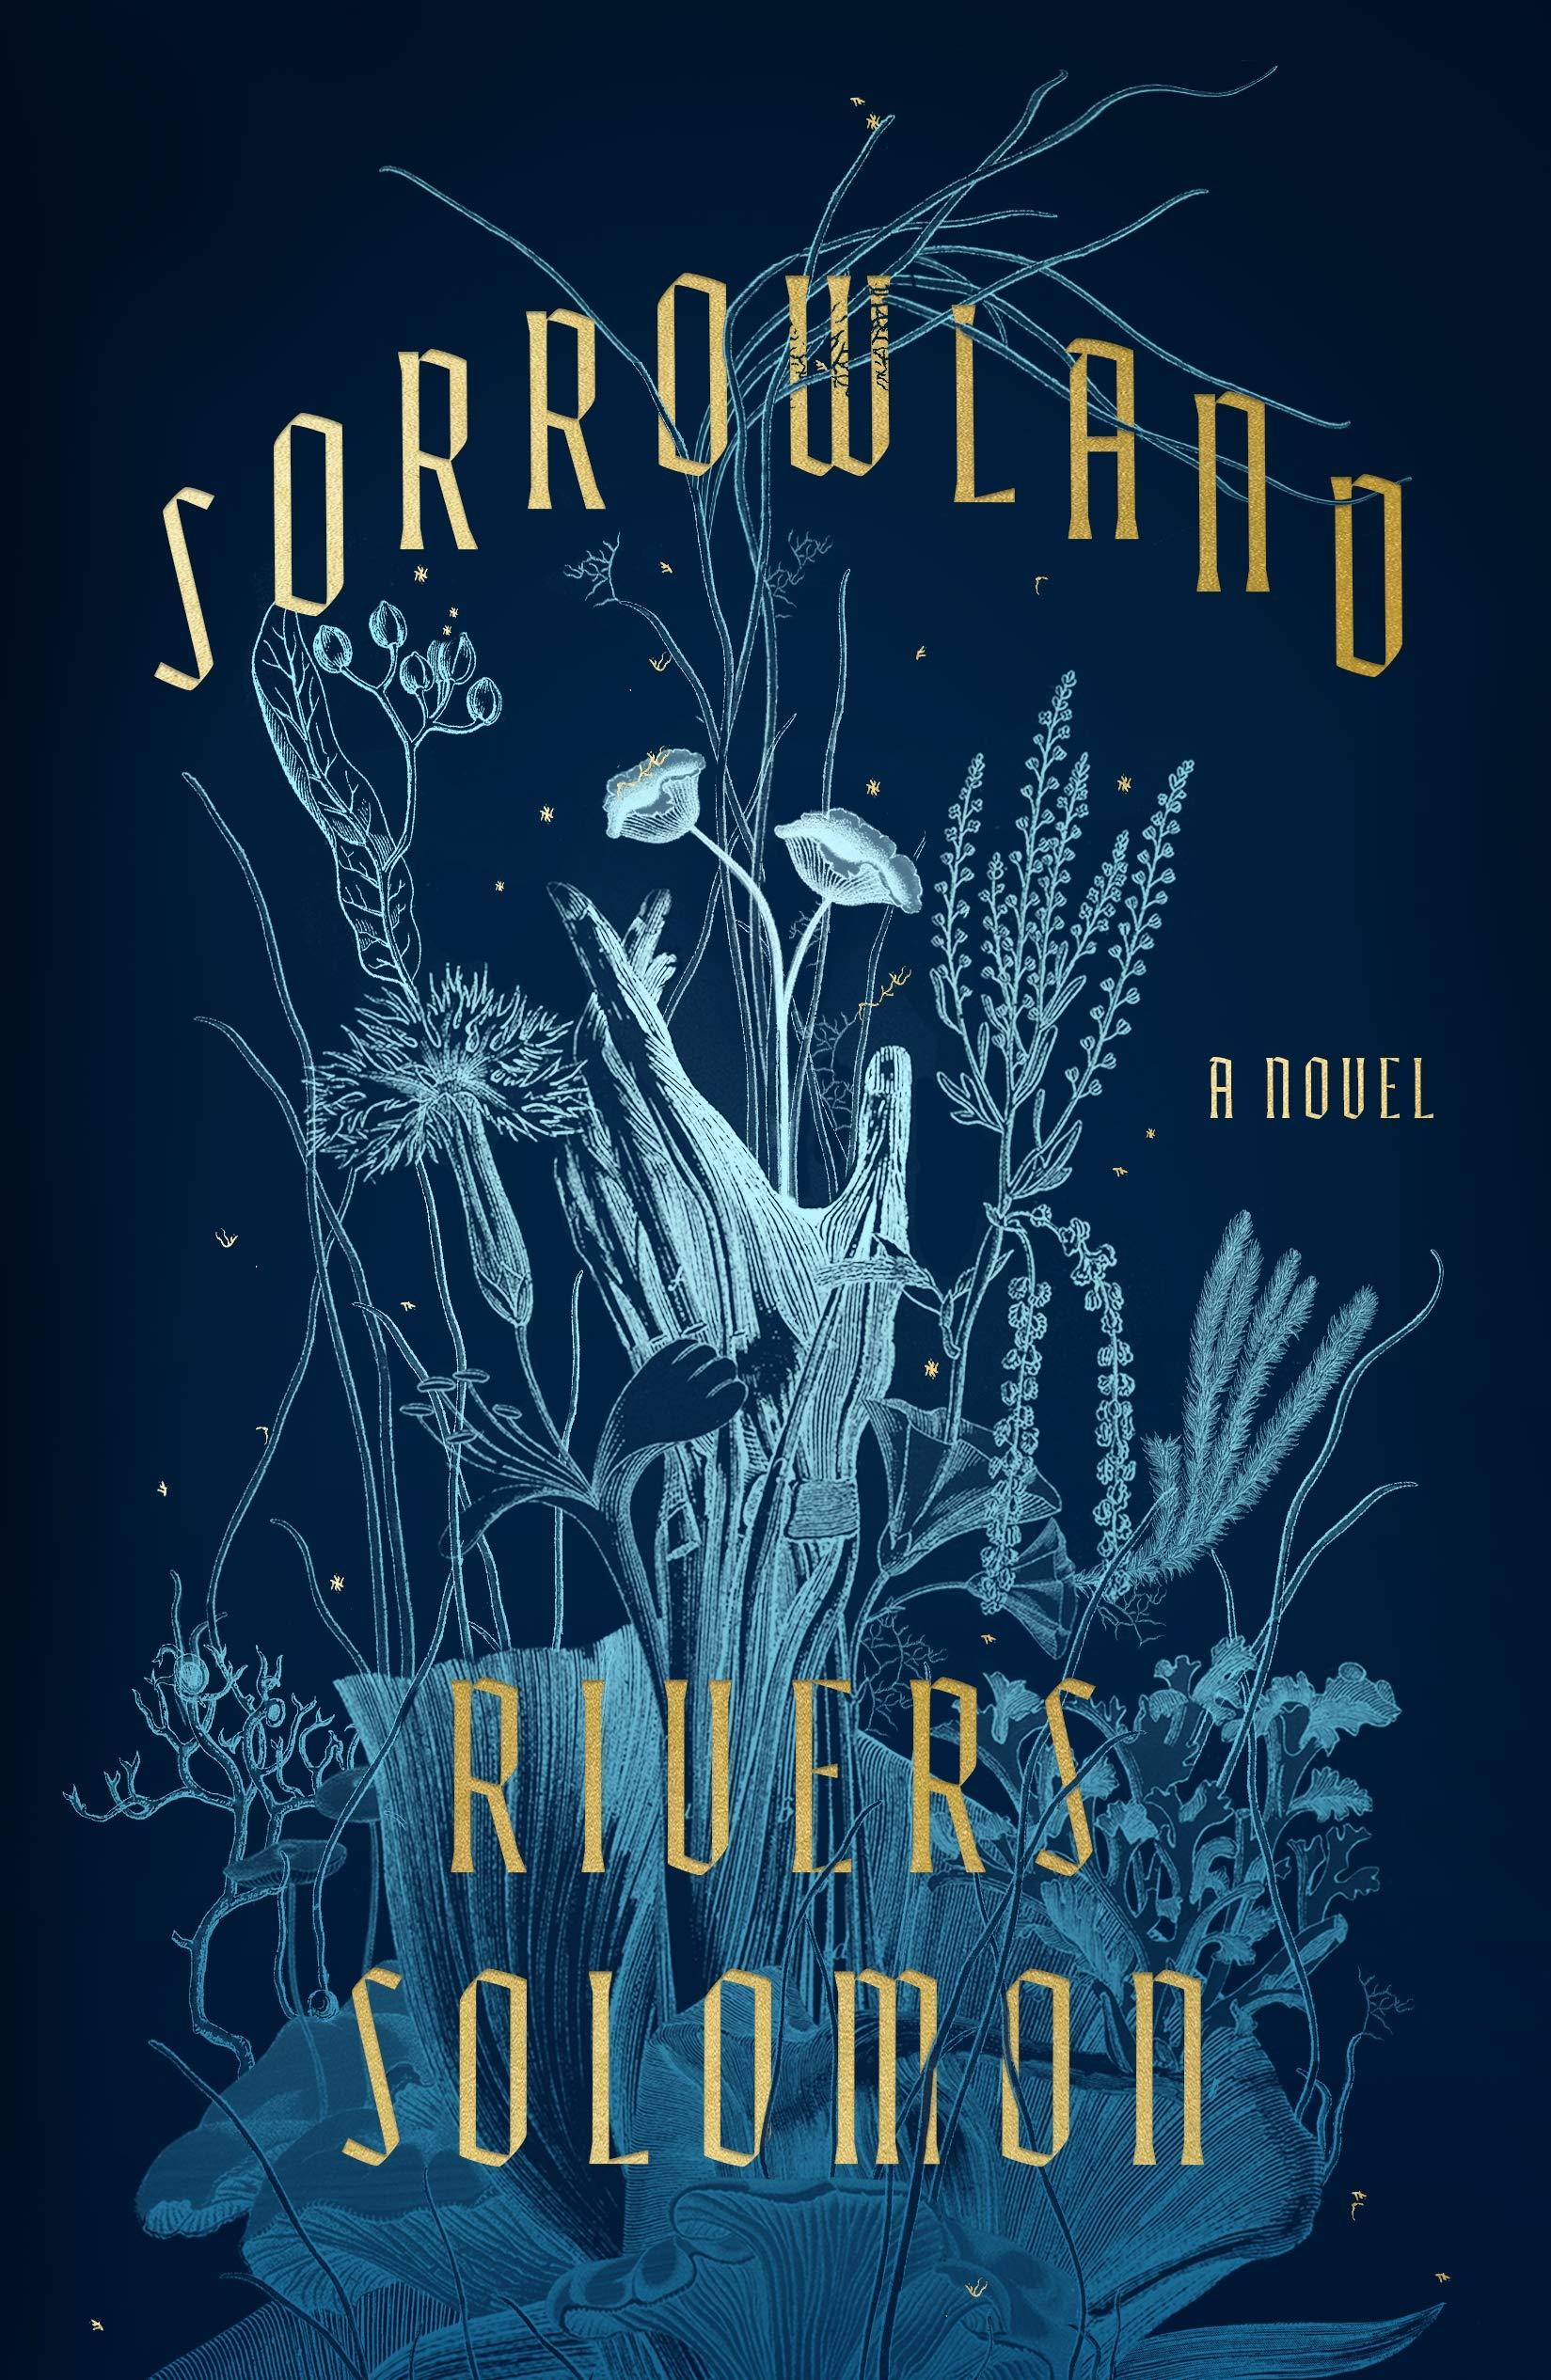 Amazon.com: Sorrowland: A Novel (9780374266776): Solomon, Rivers: Books